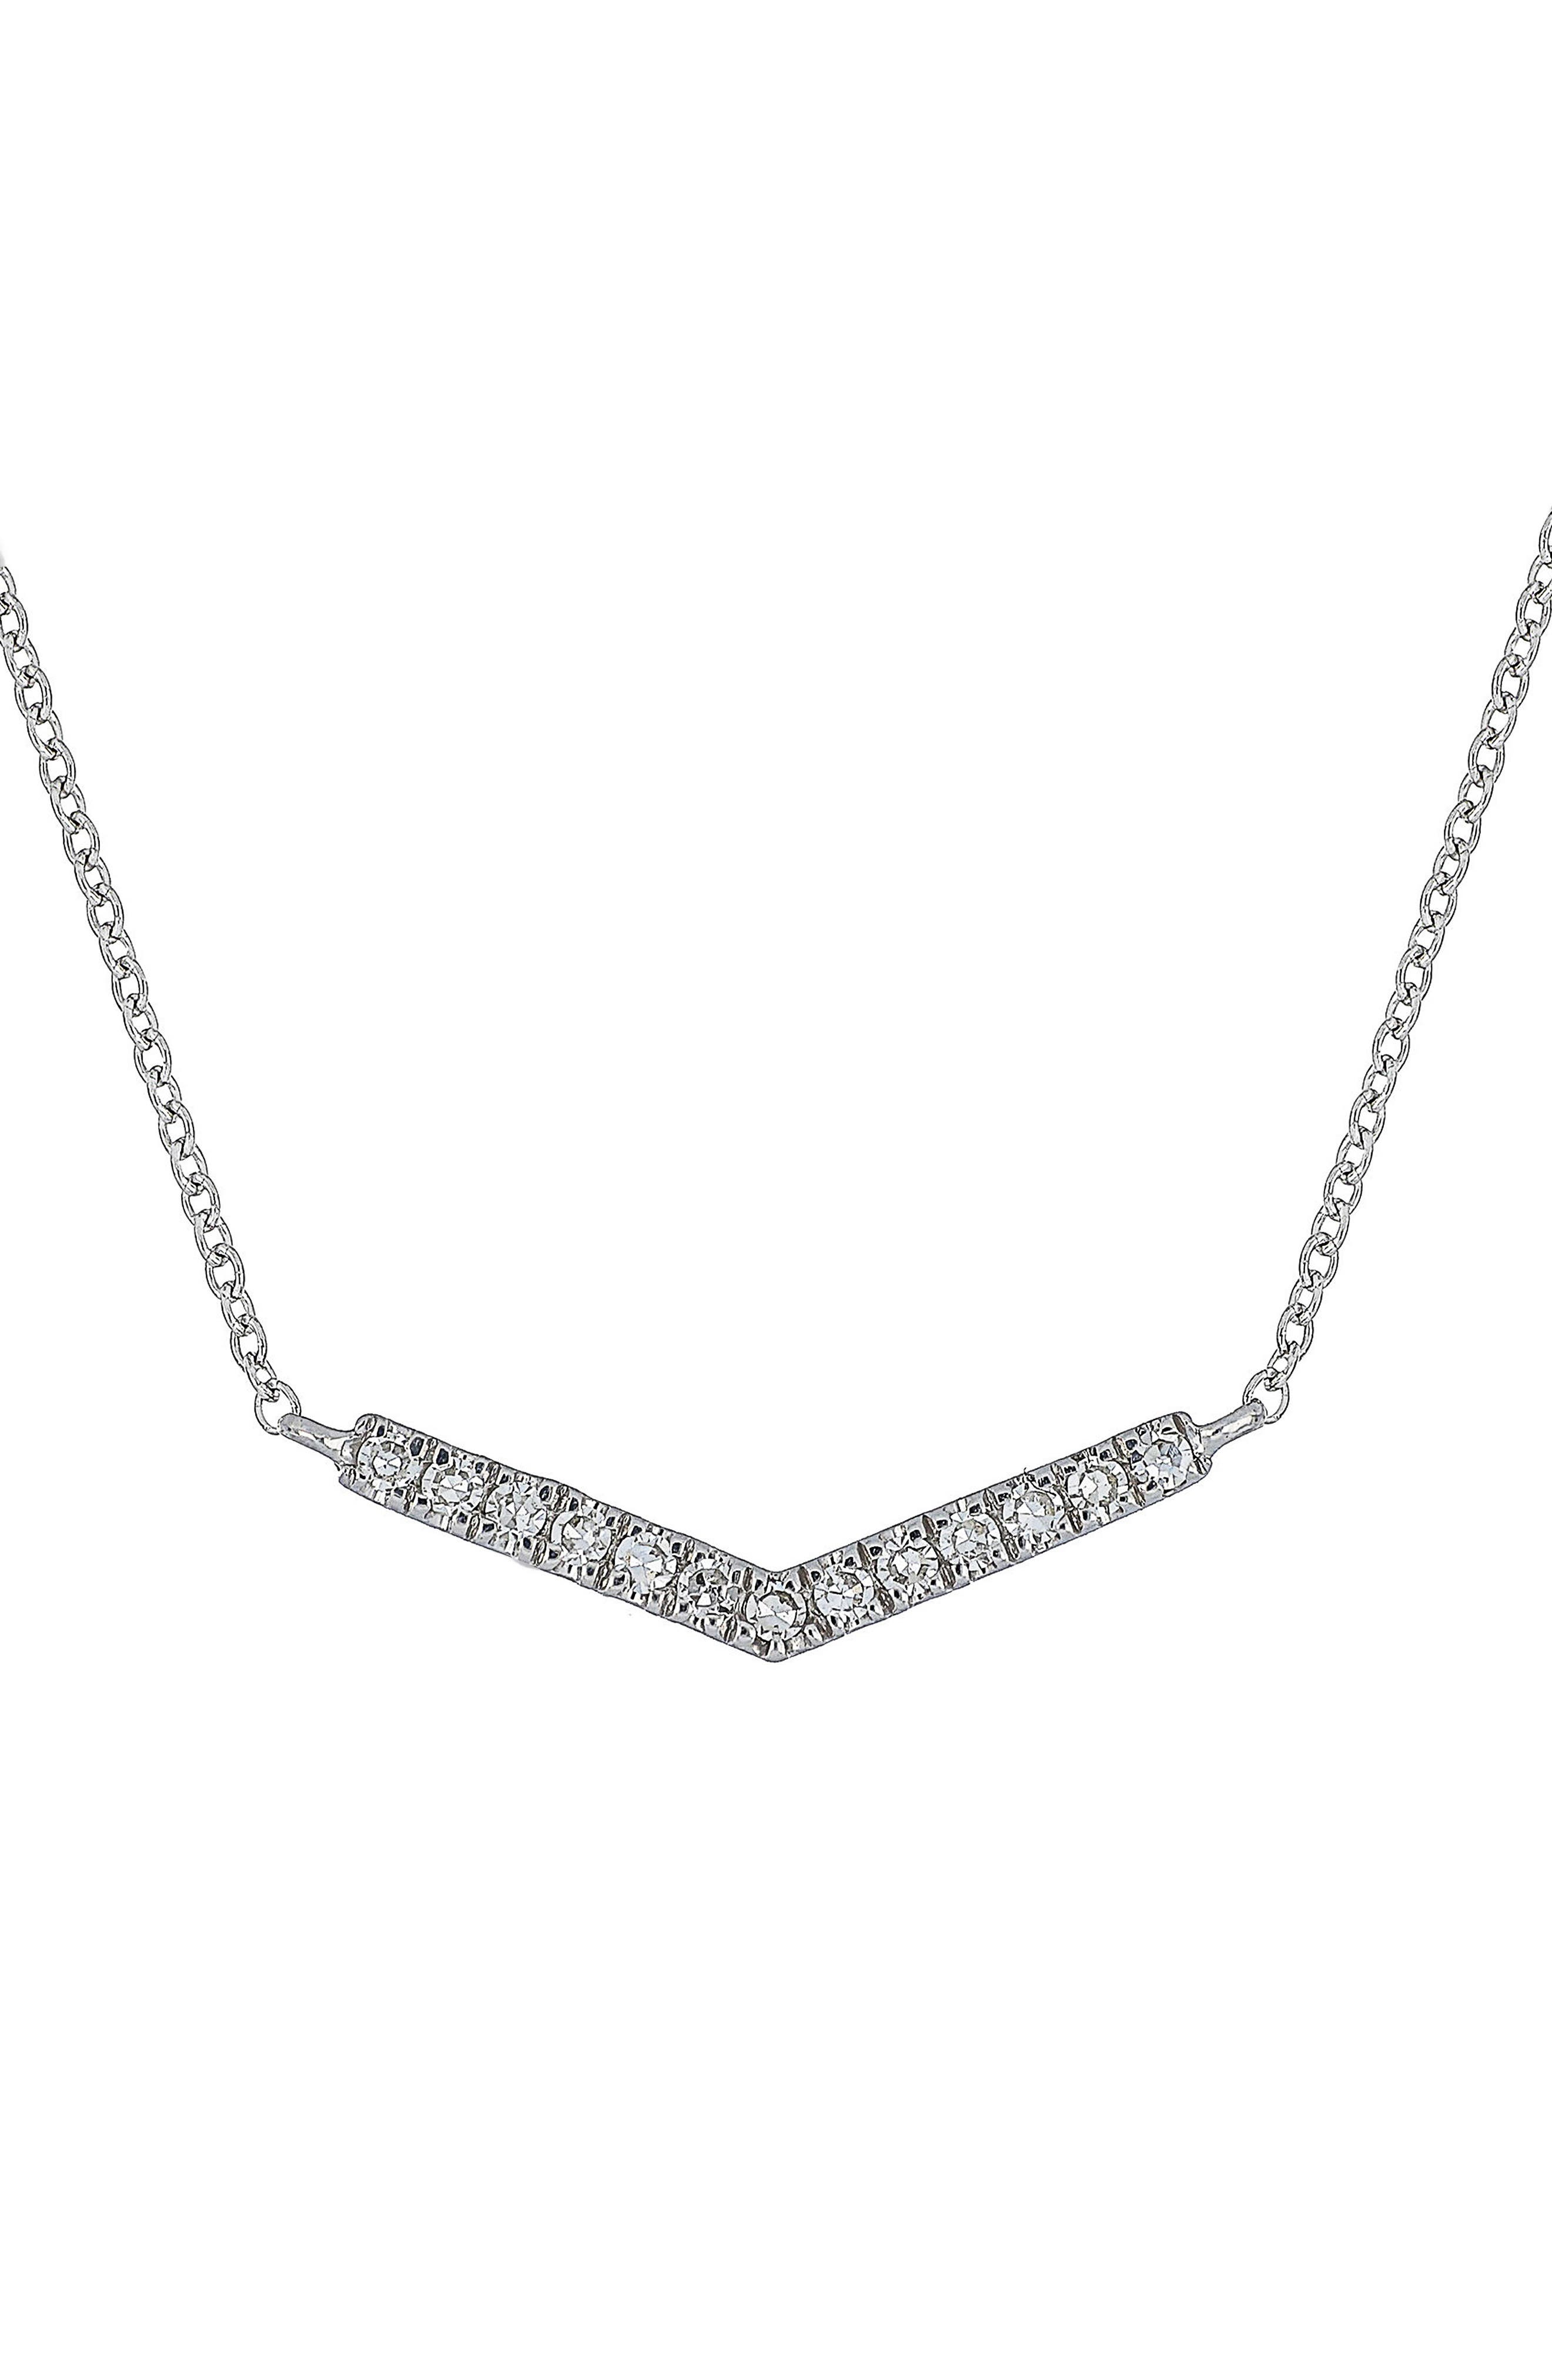 Carrière Diamond Chevron Pendant Necklace,                             Main thumbnail 1, color,                             Silver/ Diamond